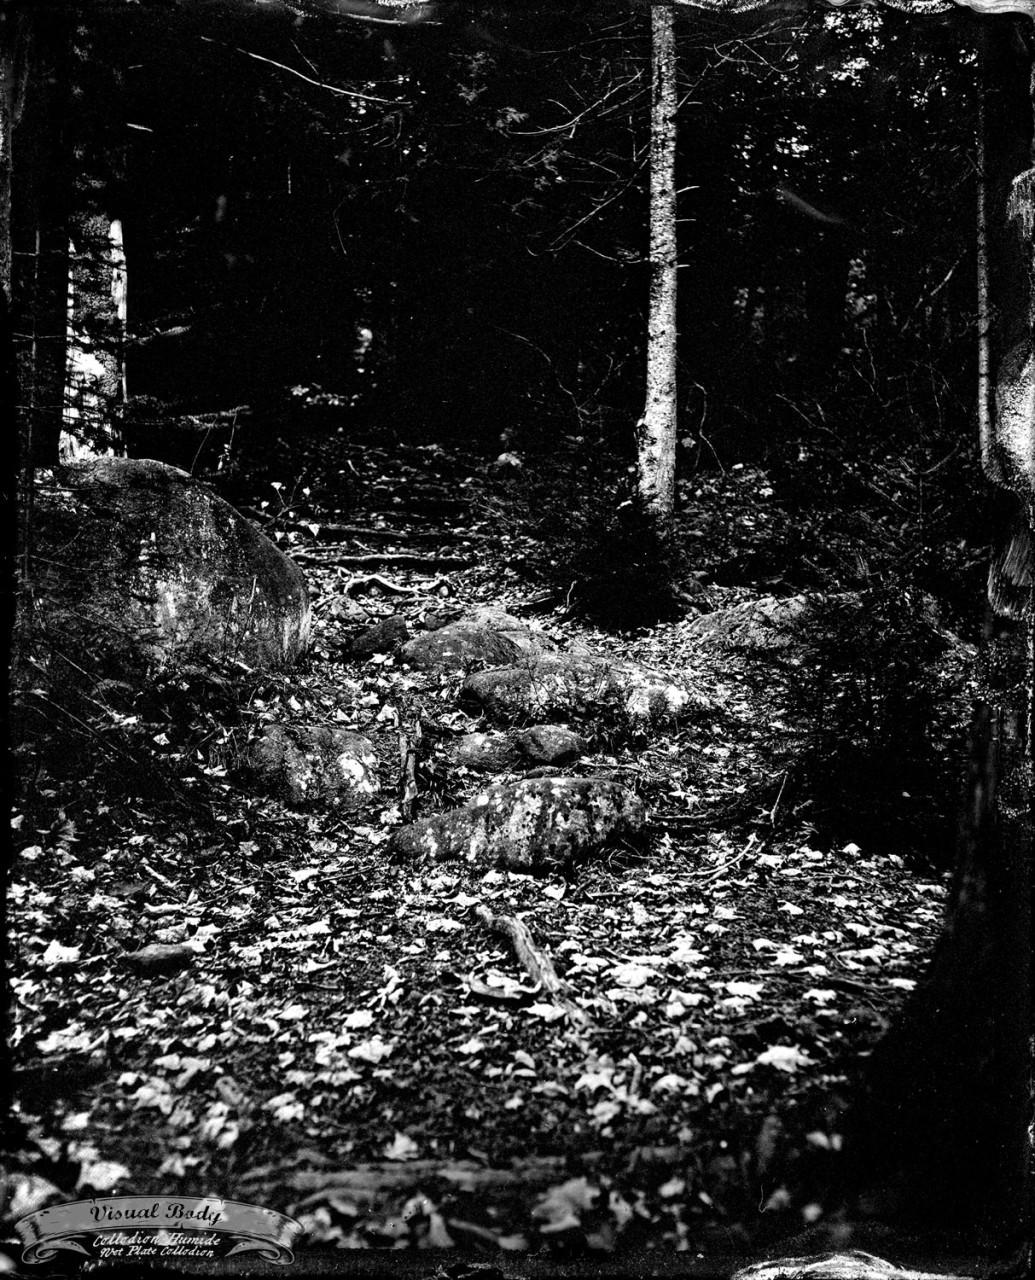 Morin-Heights, 4x5, Tintype.